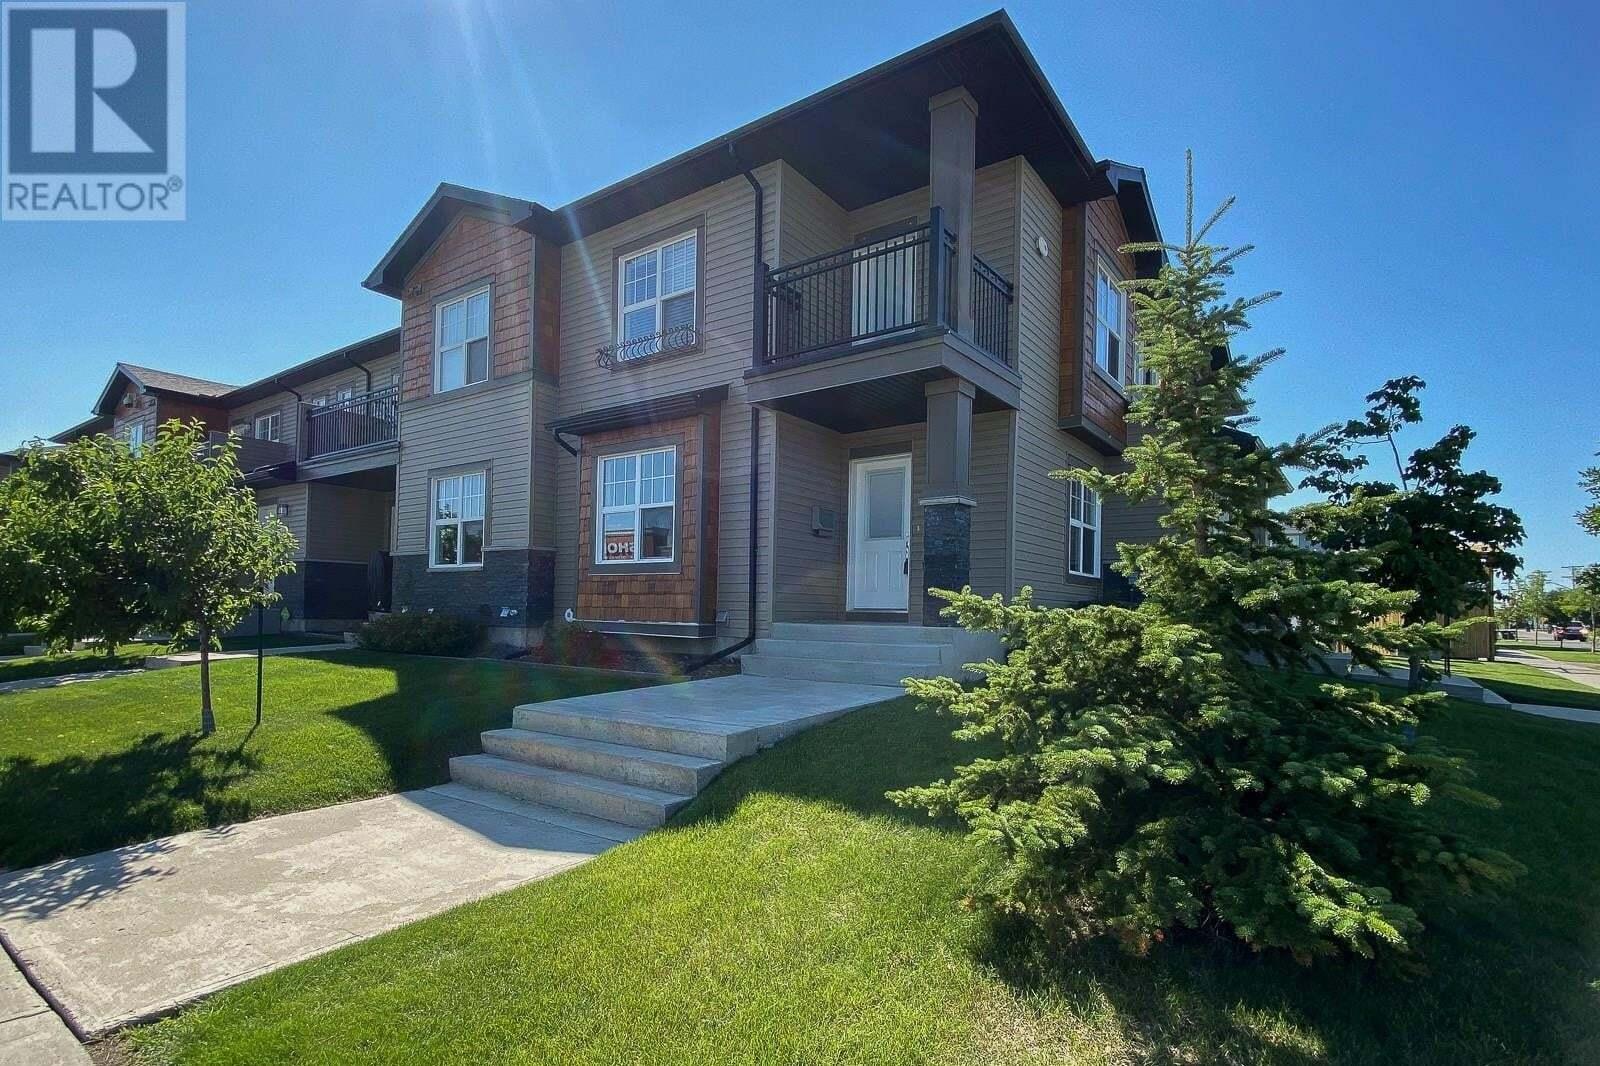 Townhouse for sale at 3013 Mcclocklin Rd Unit 209 Saskatoon Saskatchewan - MLS: SK827087